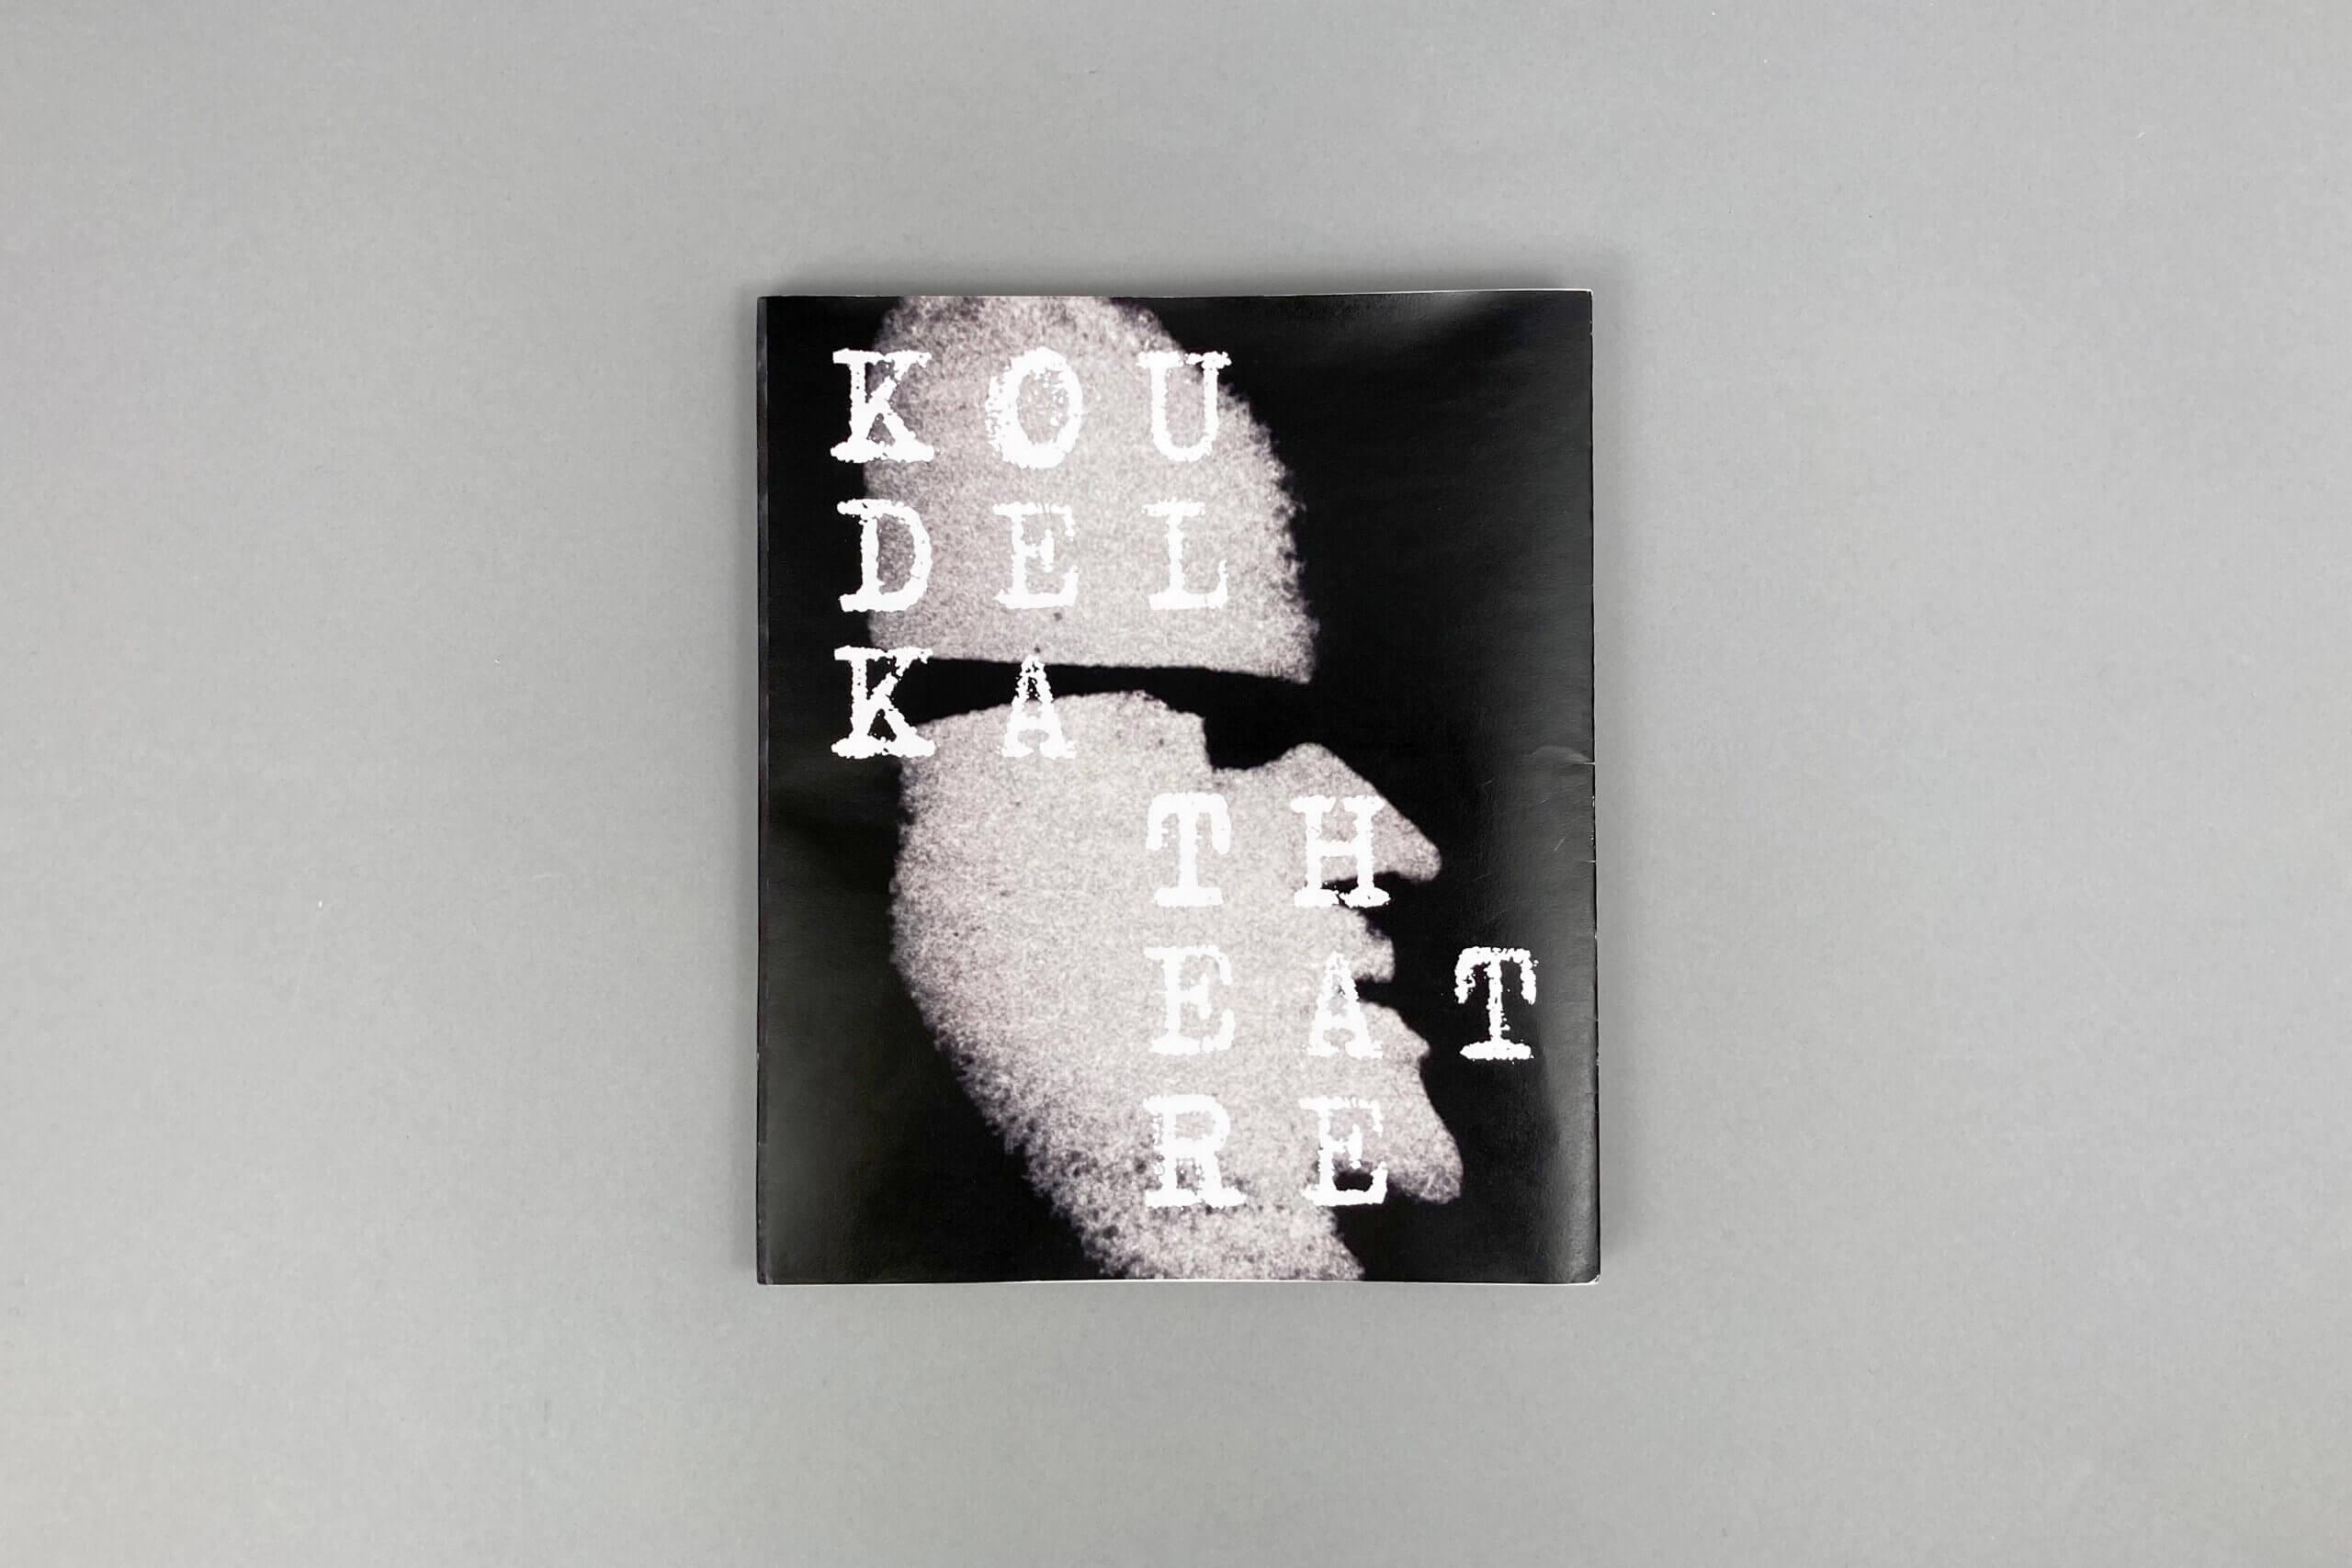 koudelka-theatre-delpire